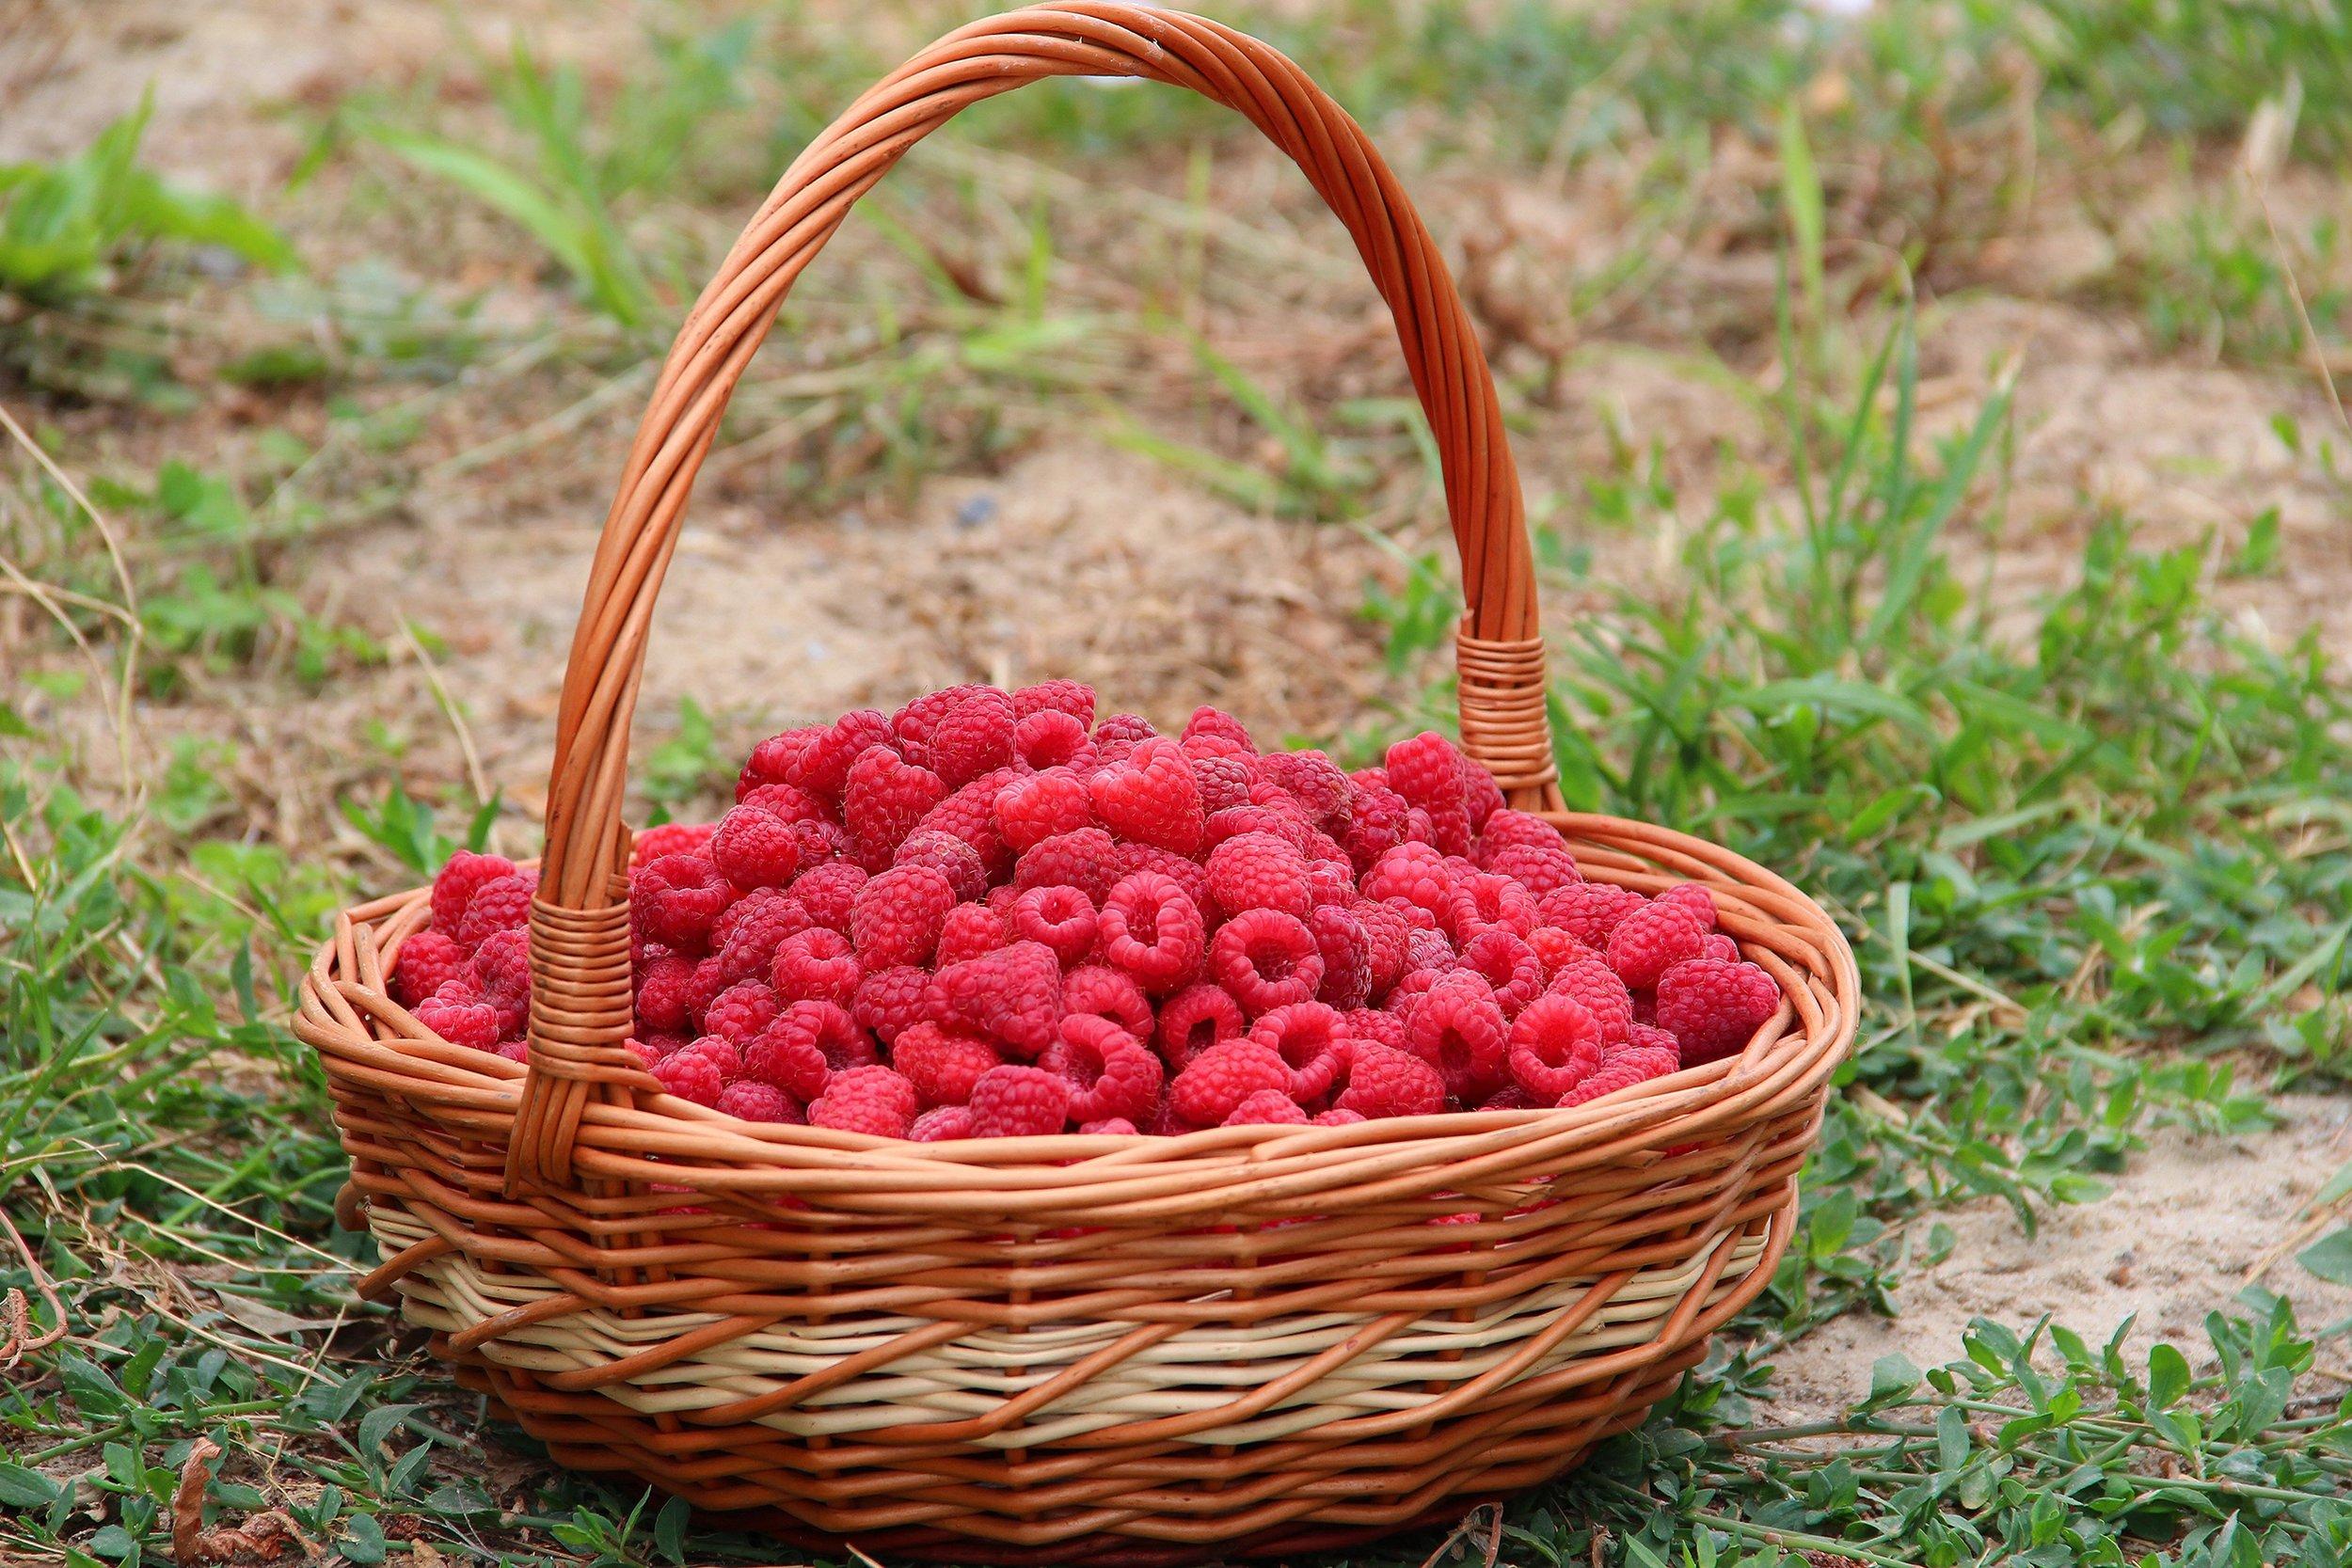 New York State berries local foods raspberries